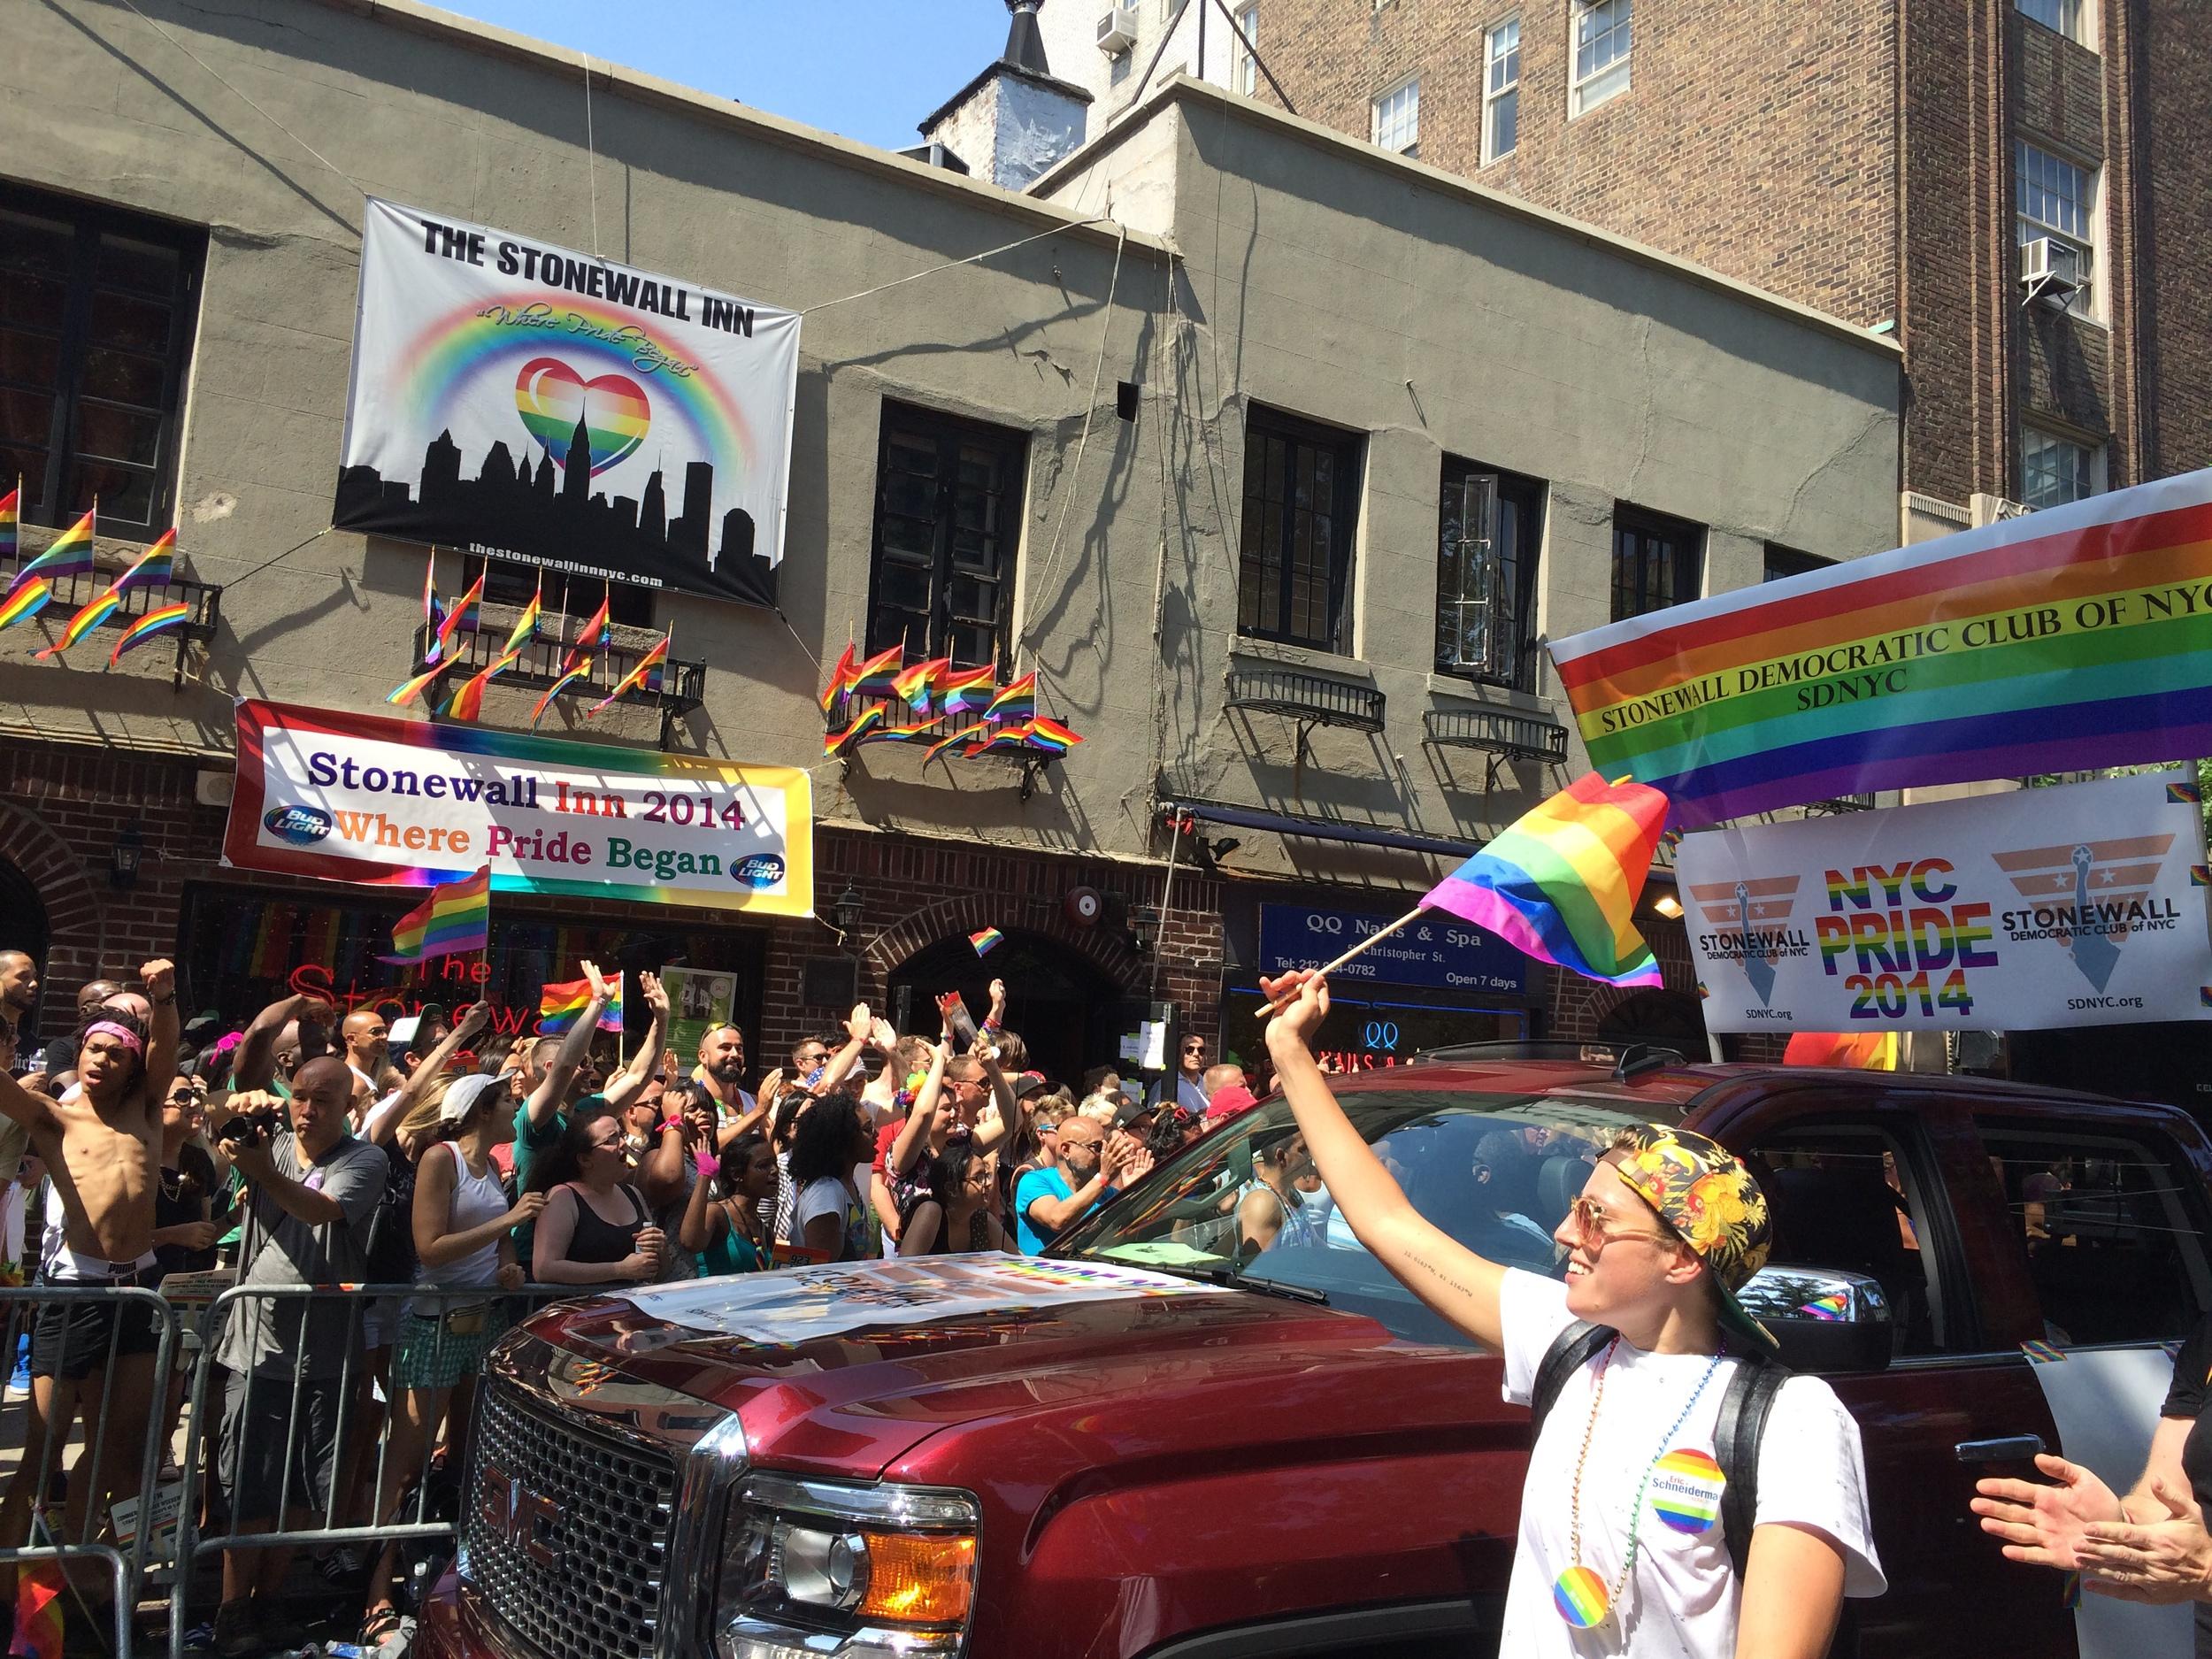 NYC Pride 2014 - SDNYC @ the Stonewall Inn